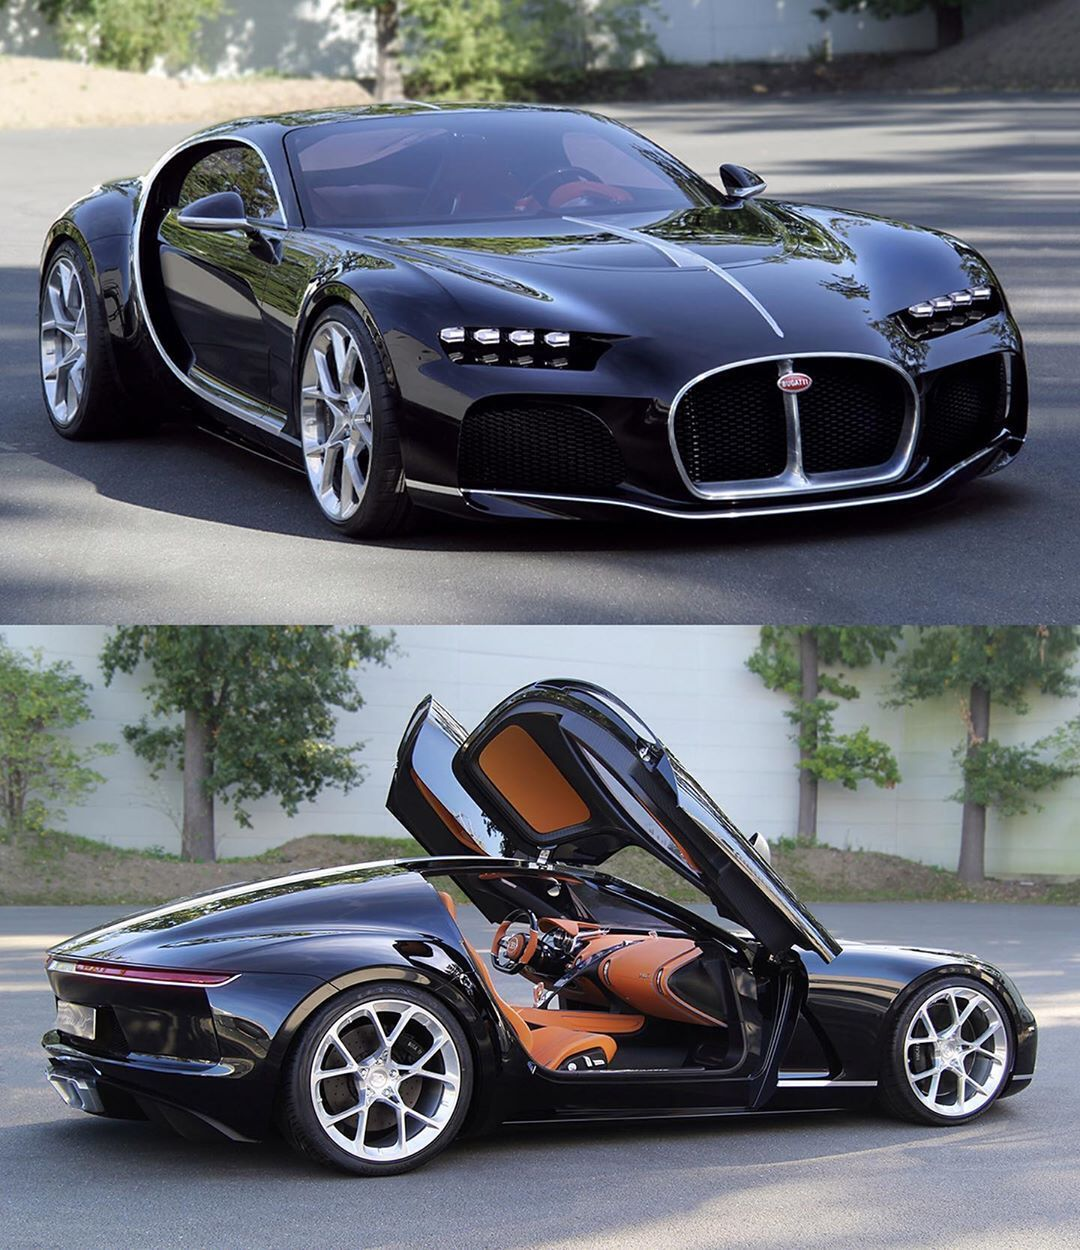 "Car Design World On Instagram: ""😳 2015 Bugatti Atlantic"